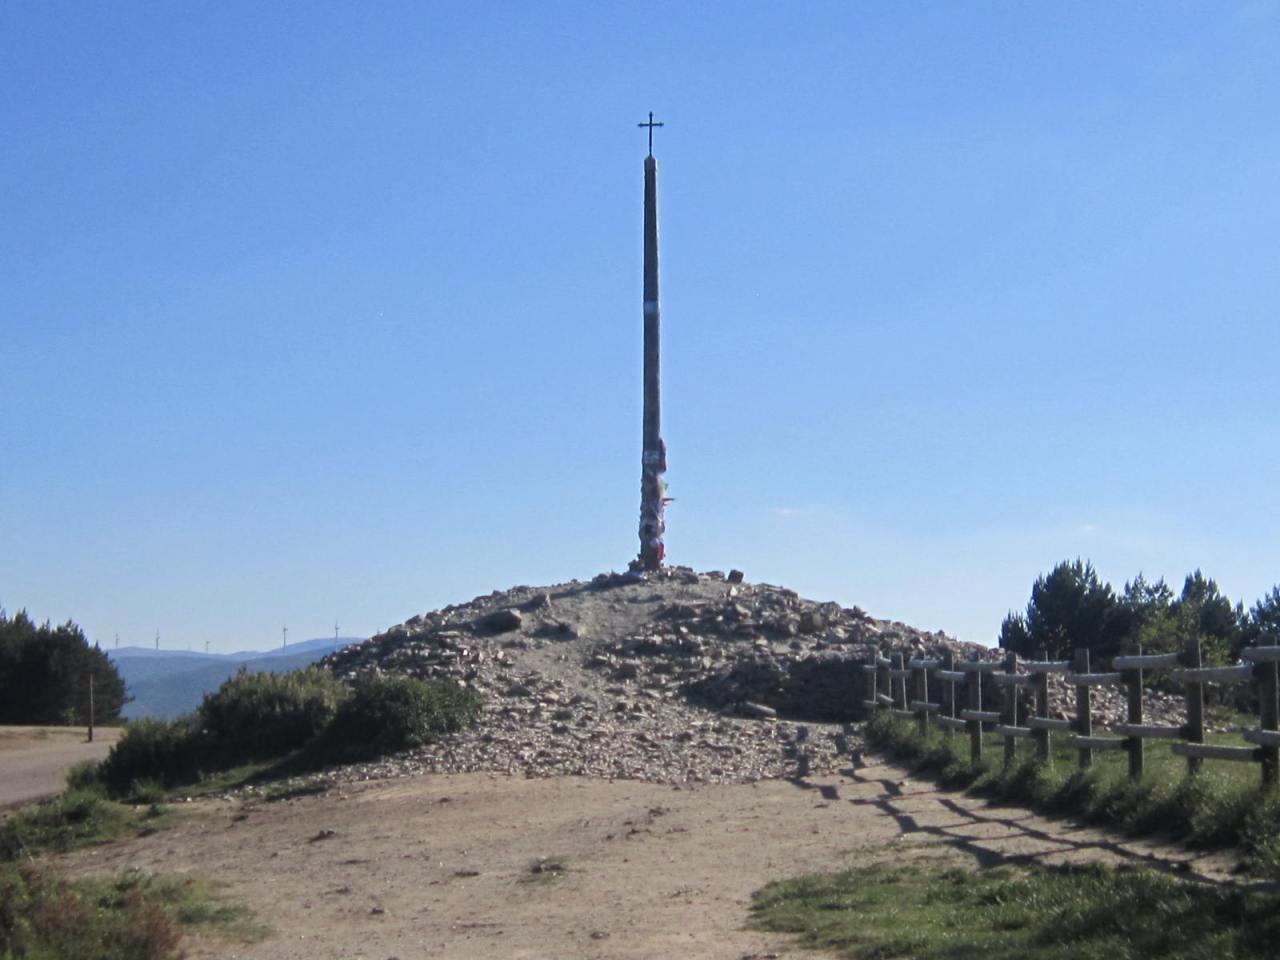 Cruz de Ferro on the Camino Frances/FrenchWay